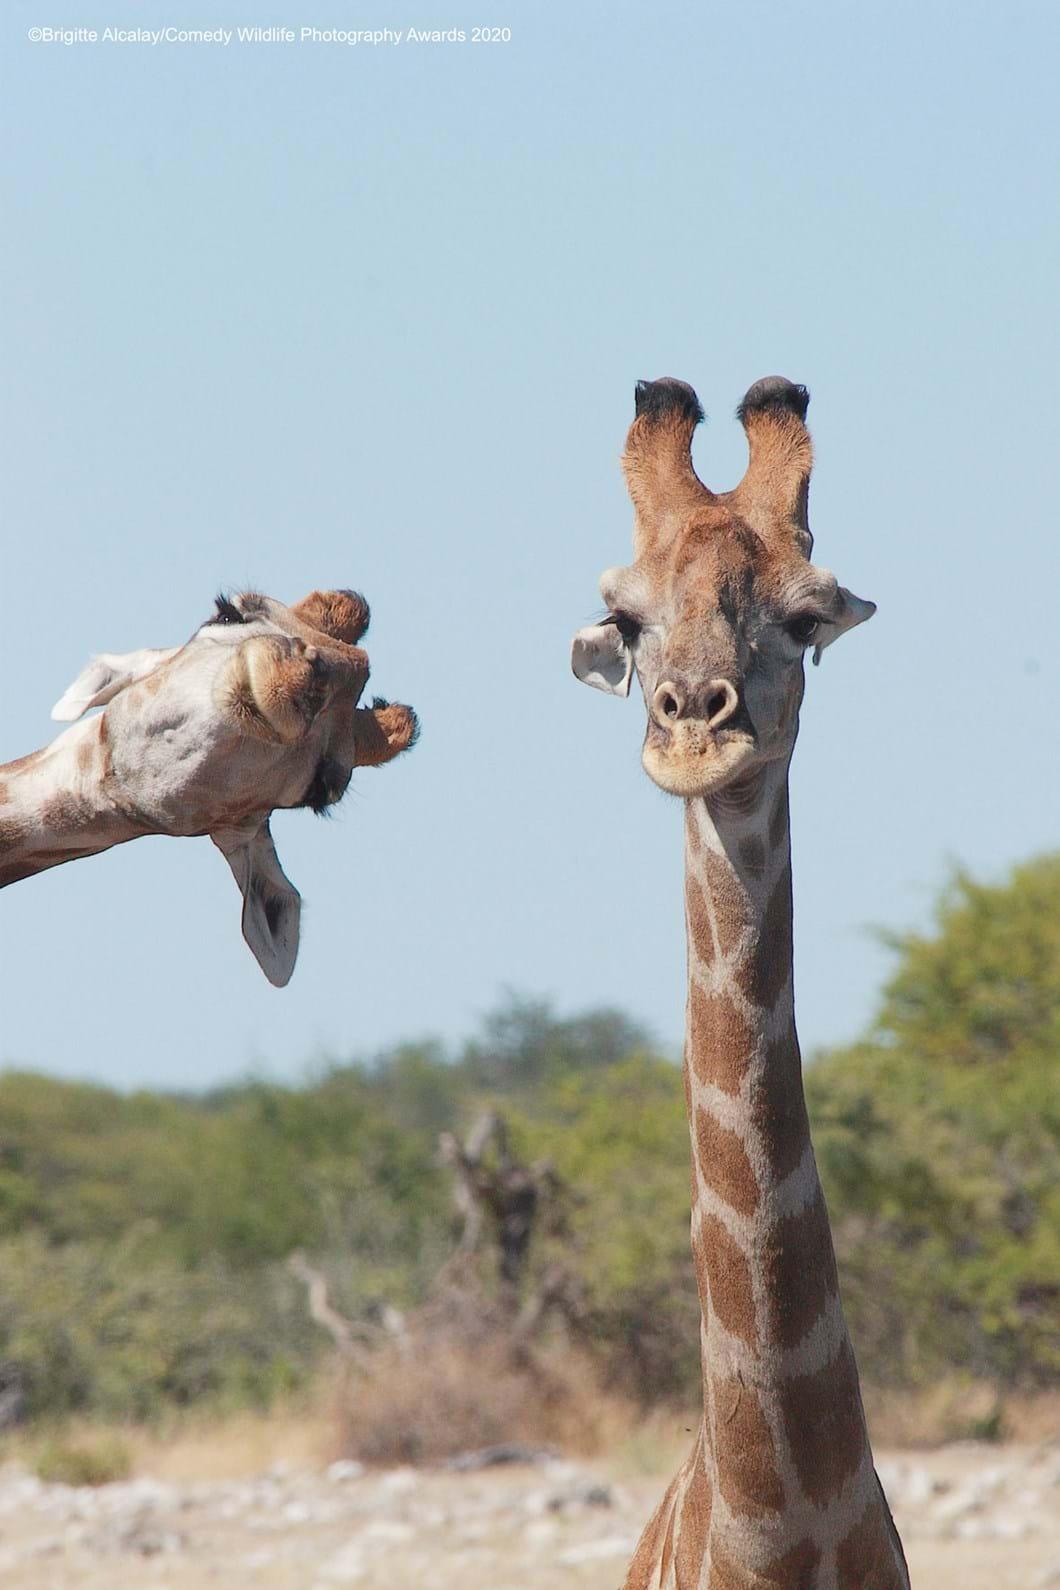 Brigitte-Alcalay-Marcon_giraffe-photobomb_2020-09-17.jpg